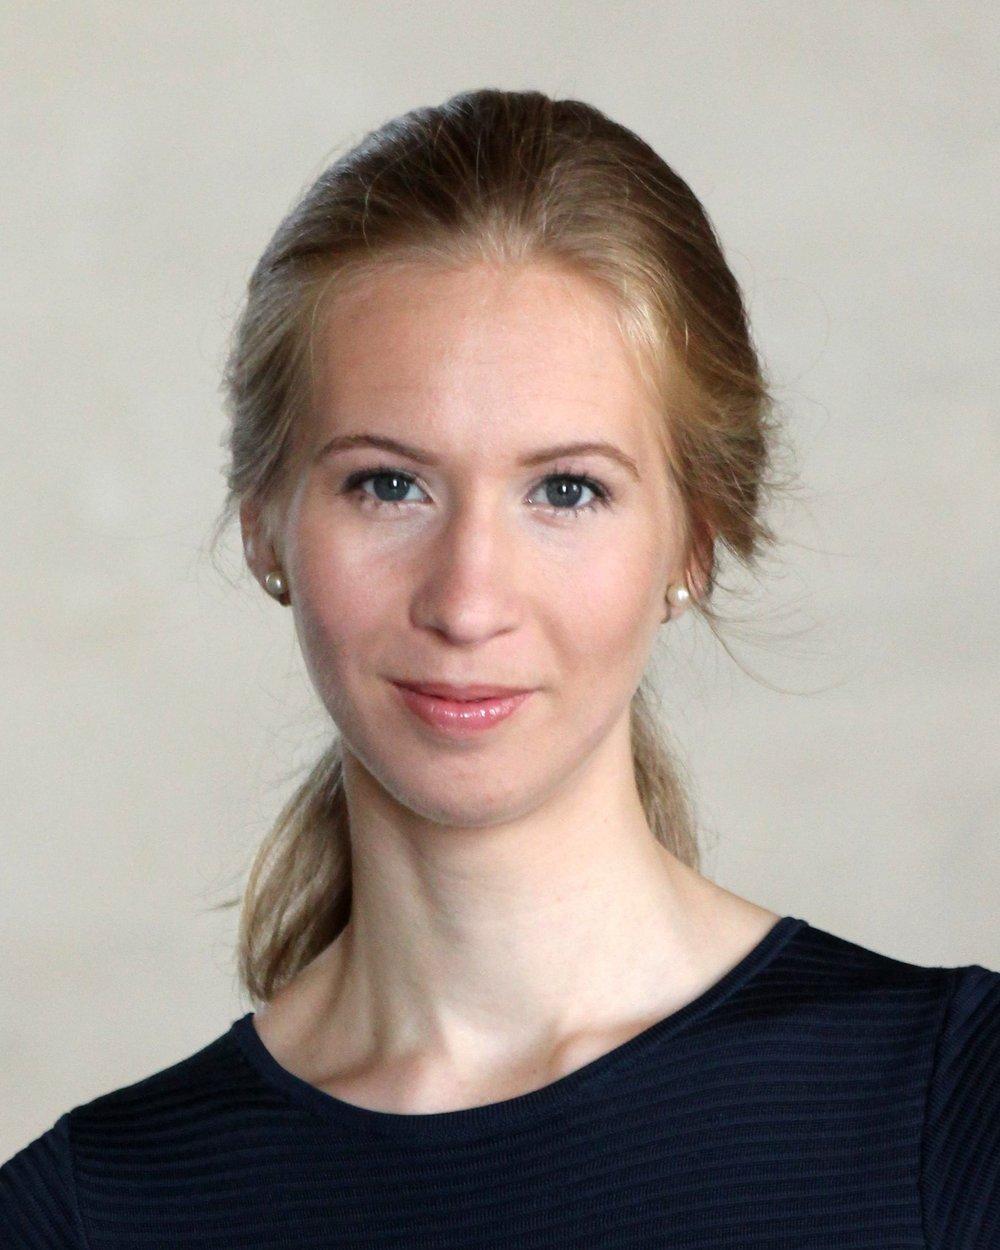 Hanna Ohlson Nordh